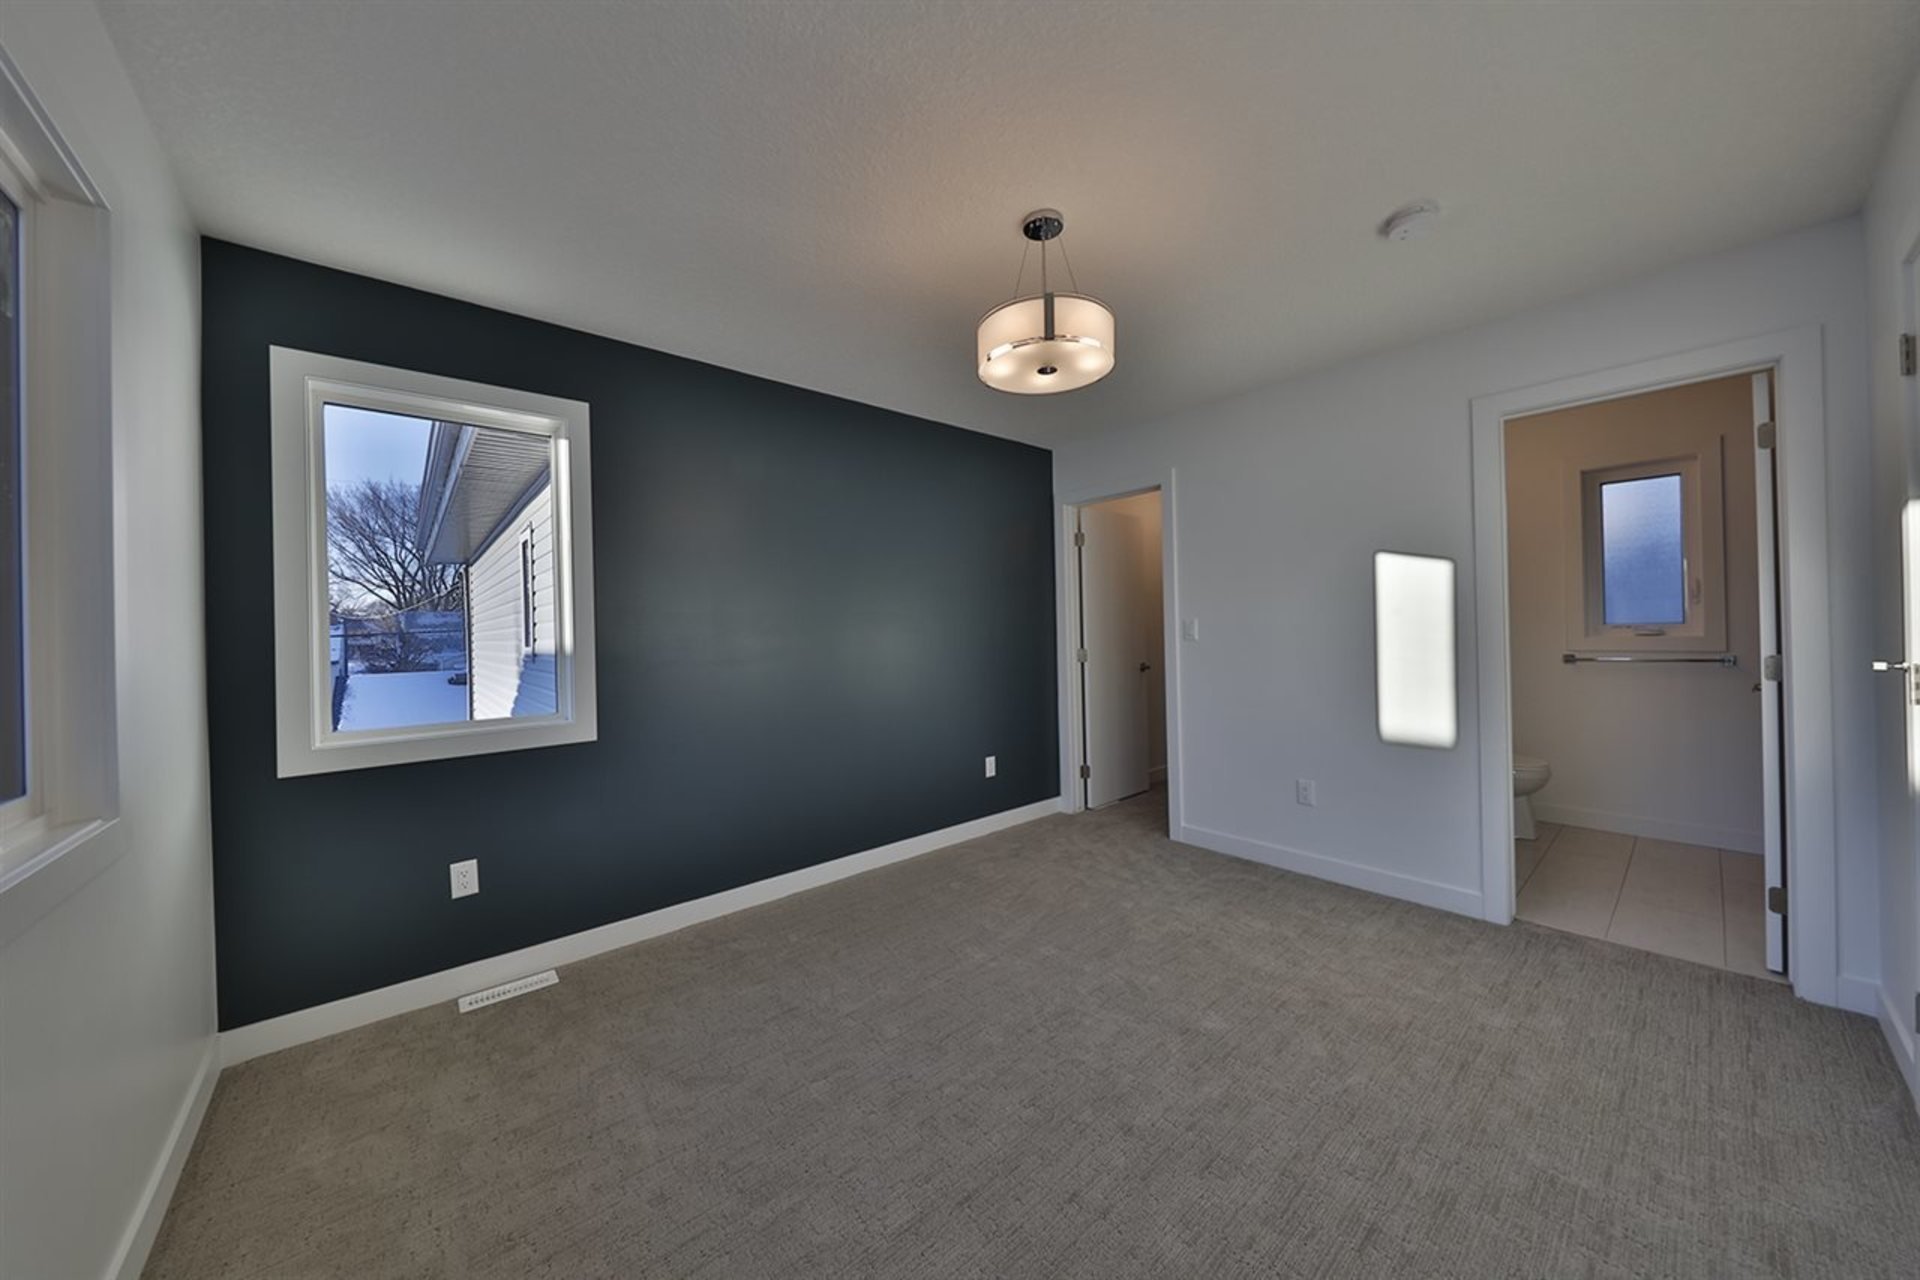 11636-84-street-parkdale_edmo-edmonton-11 at 11636 84 Street, Parkdale_EDMO, Edmonton